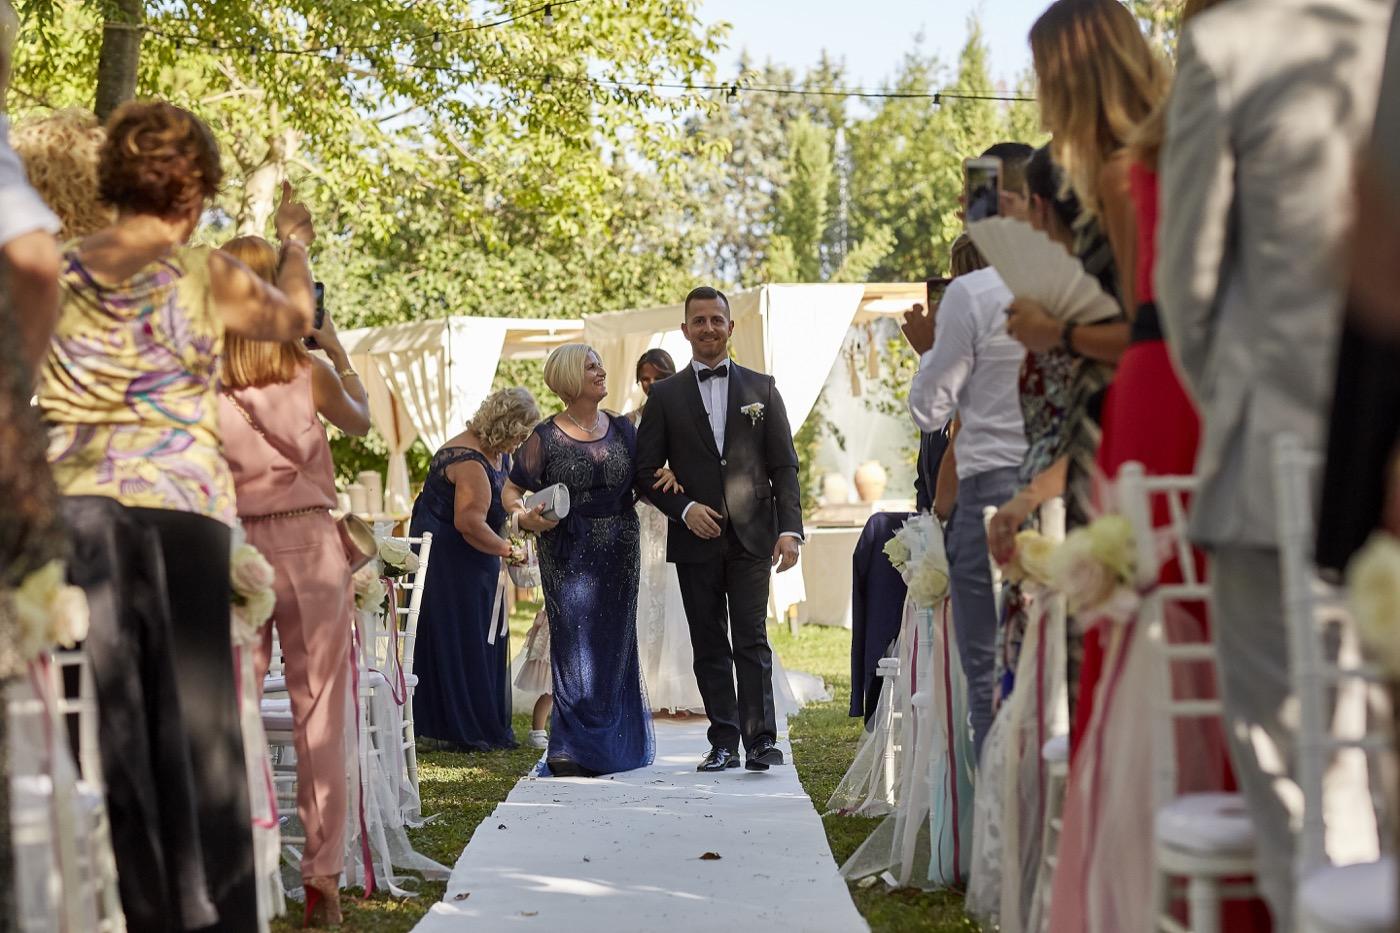 Claudio-Coppola-wedding-photographer-la-scuderia-eventi-preparativi-la-rosetta-perugia-45